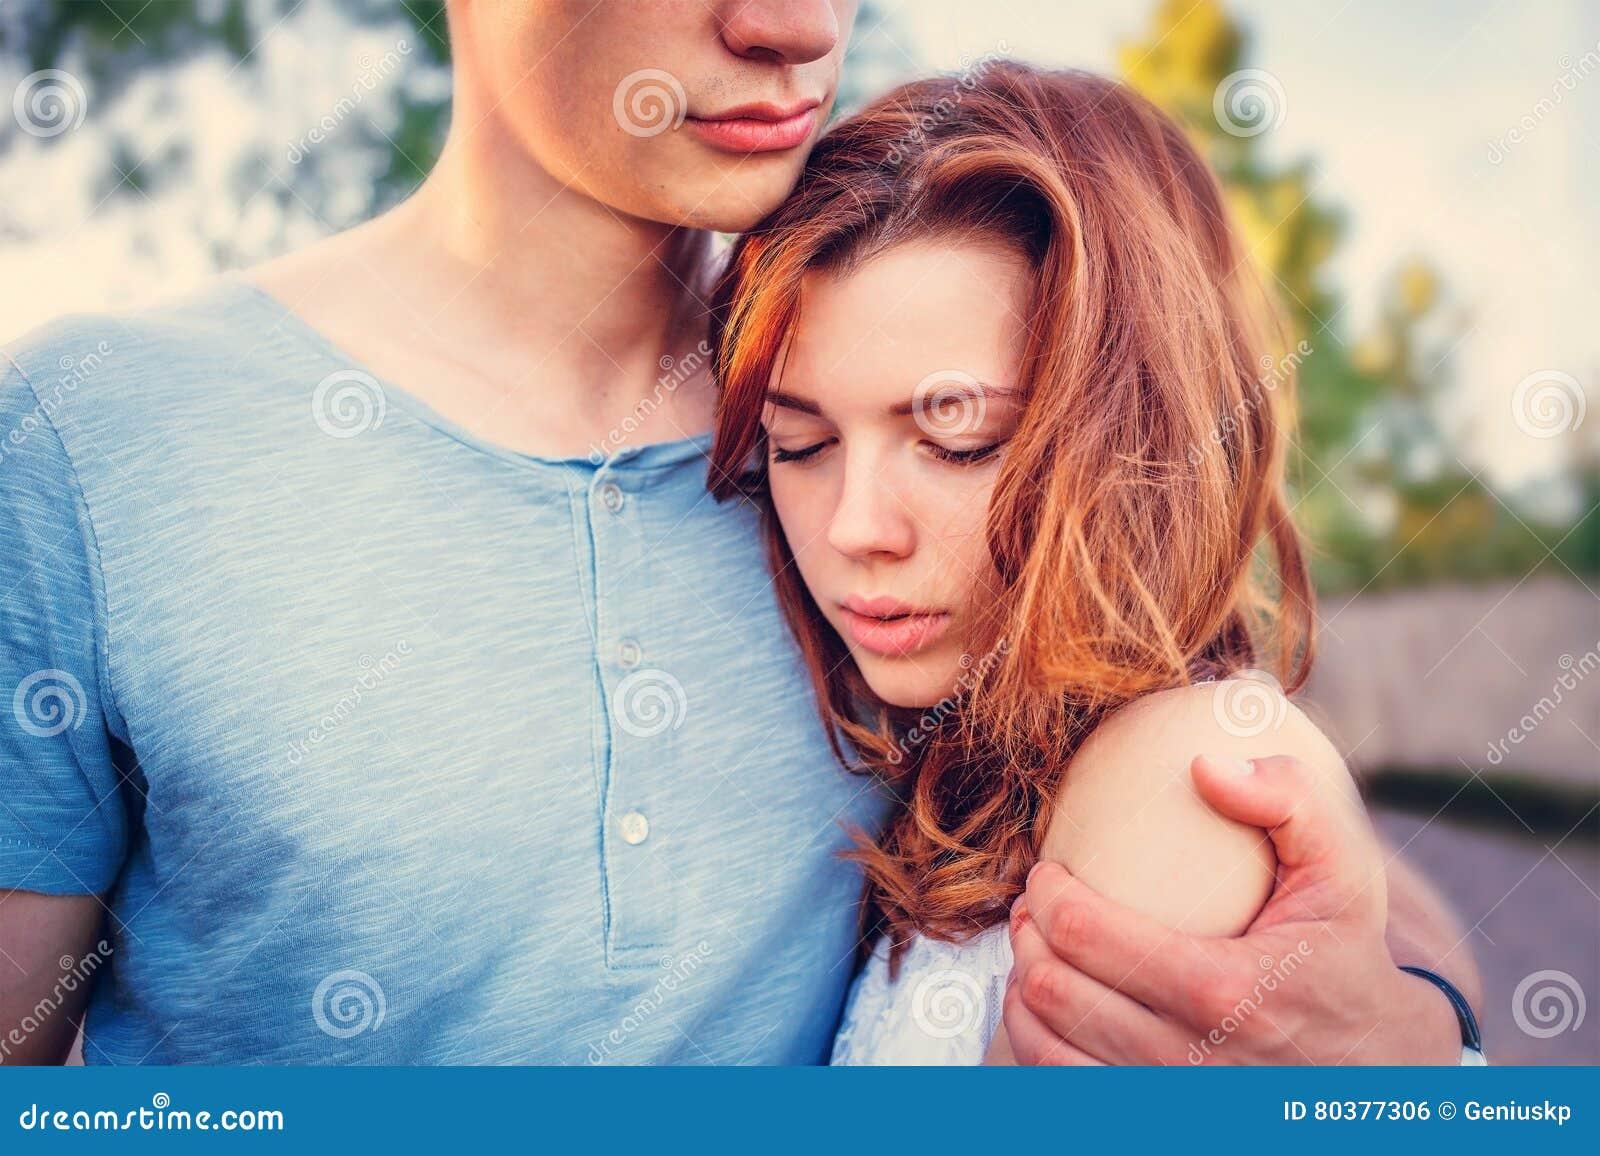 Dating up ragazzo David Rossi dating Strauss